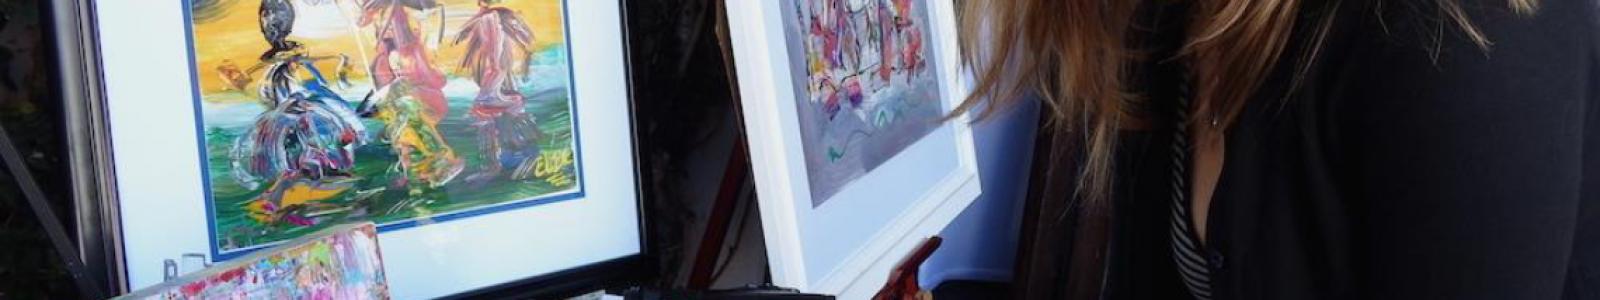 Gallery Painter Elbe Brave